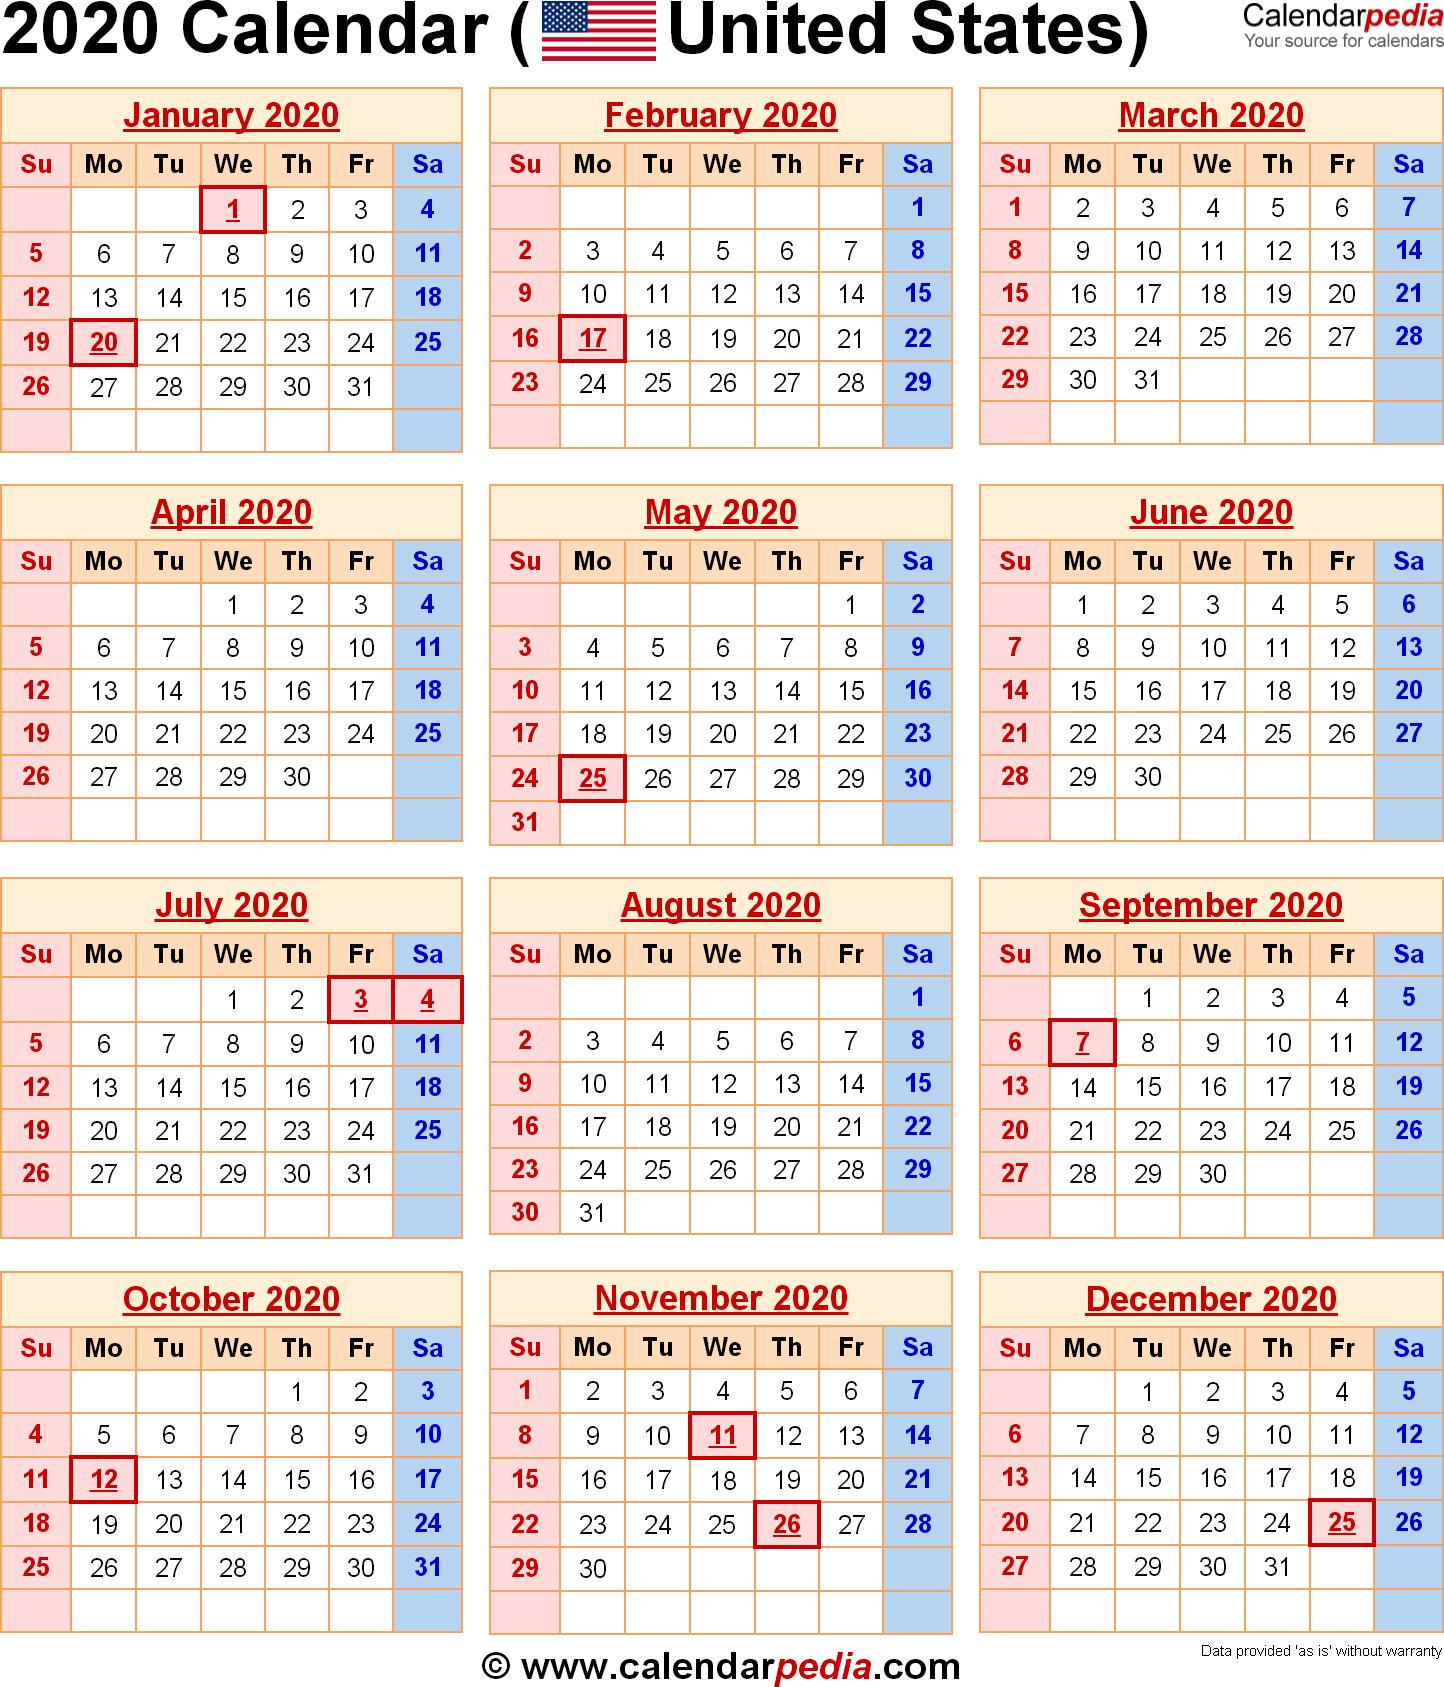 Calendar 2020 Printable With Holidays - Wpa.wpart.co throughout 2020 Calendar With Holidays Printable Free